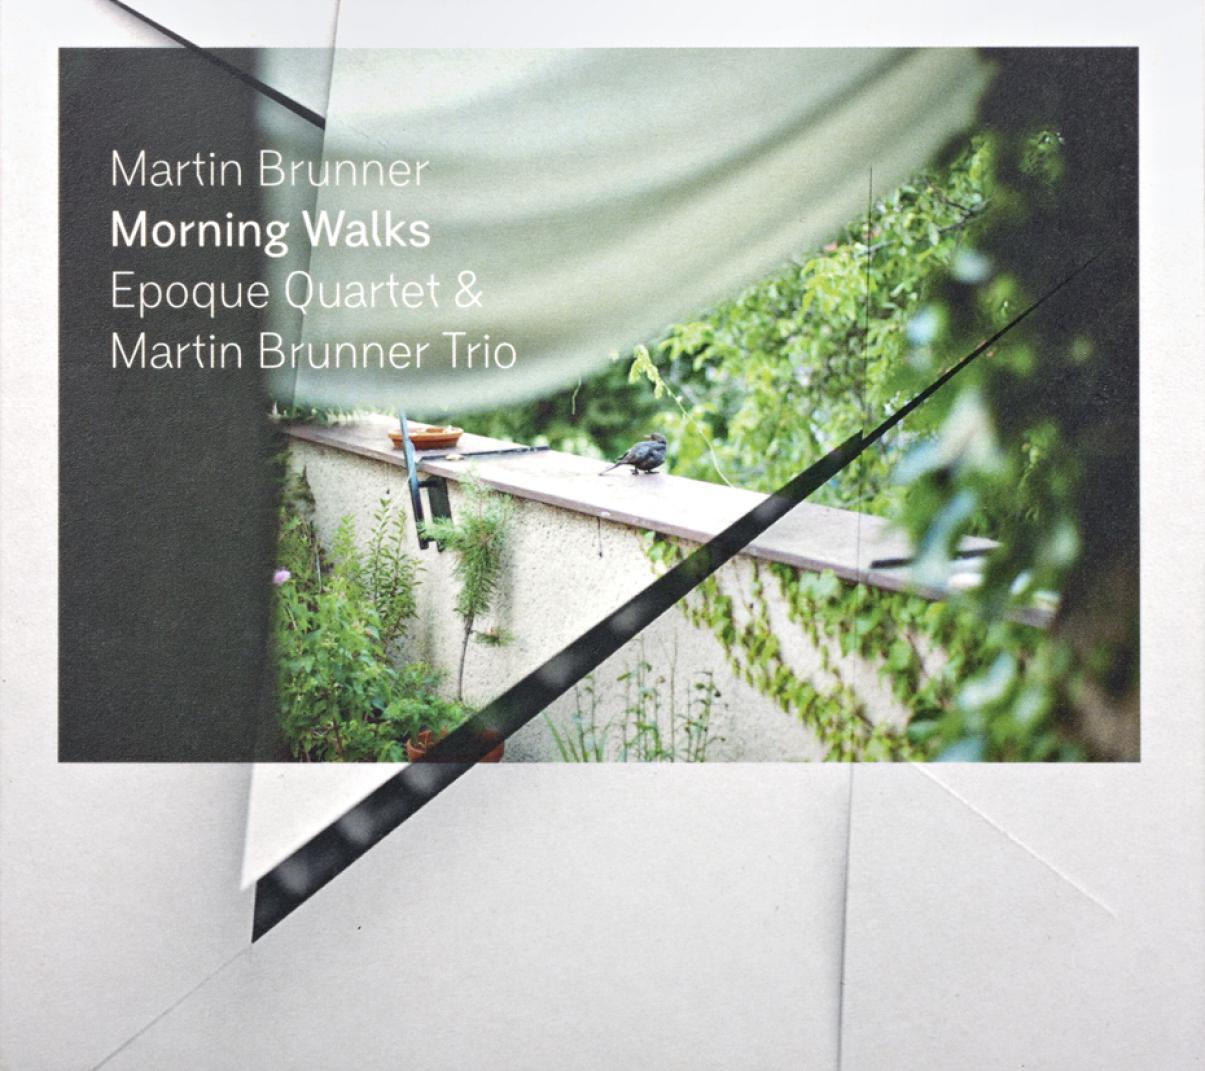 Martin Brunner: Morning Walks